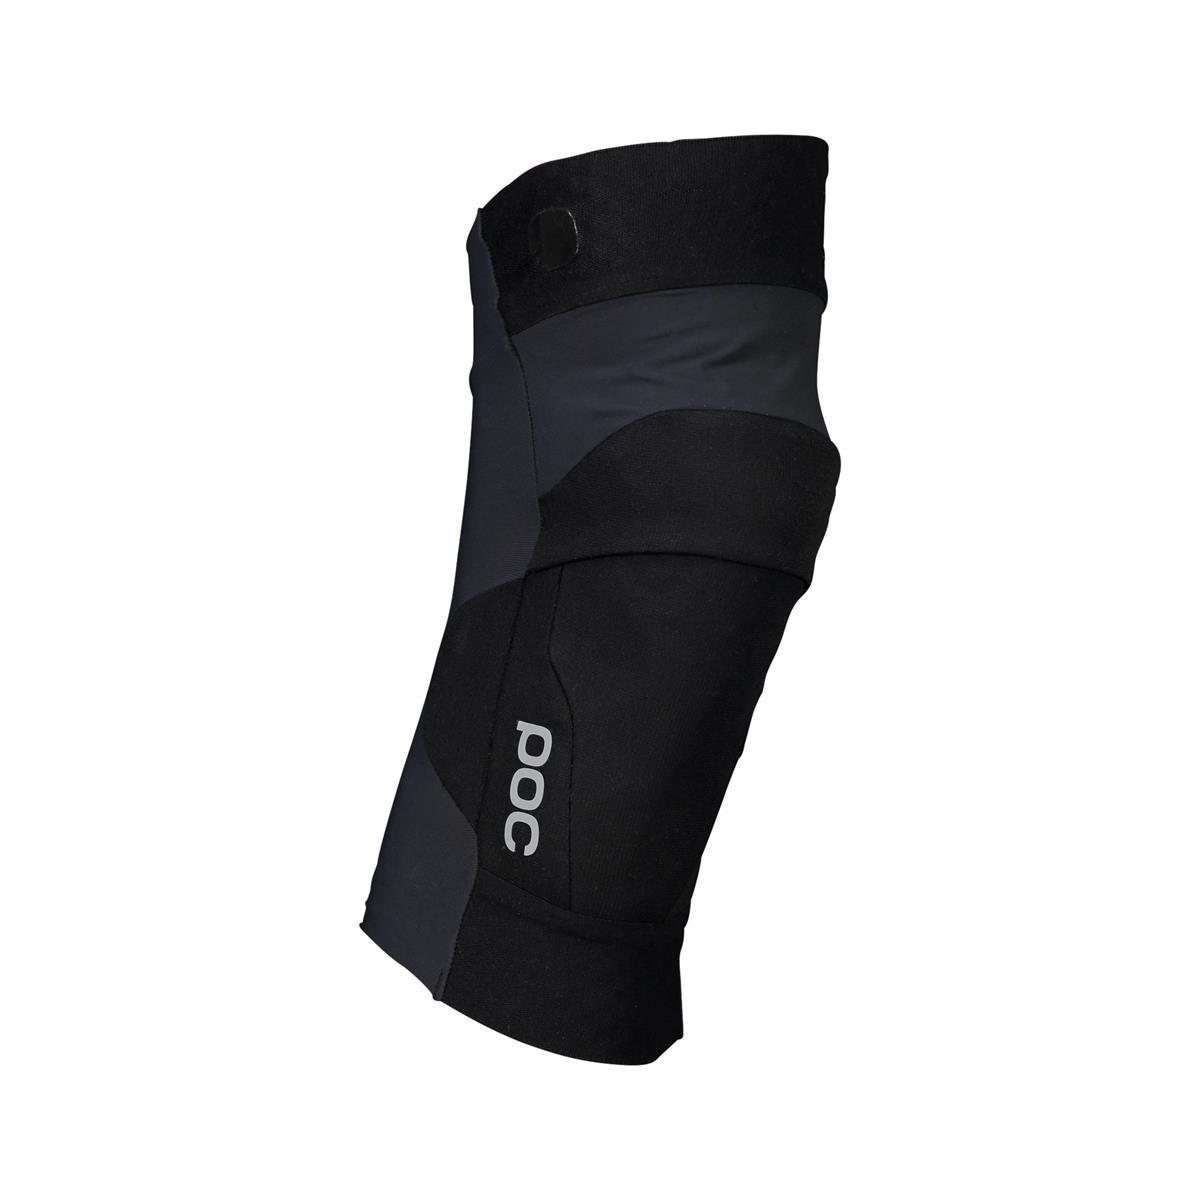 Oseus VPD Knee Protectors Uranium Black Size S